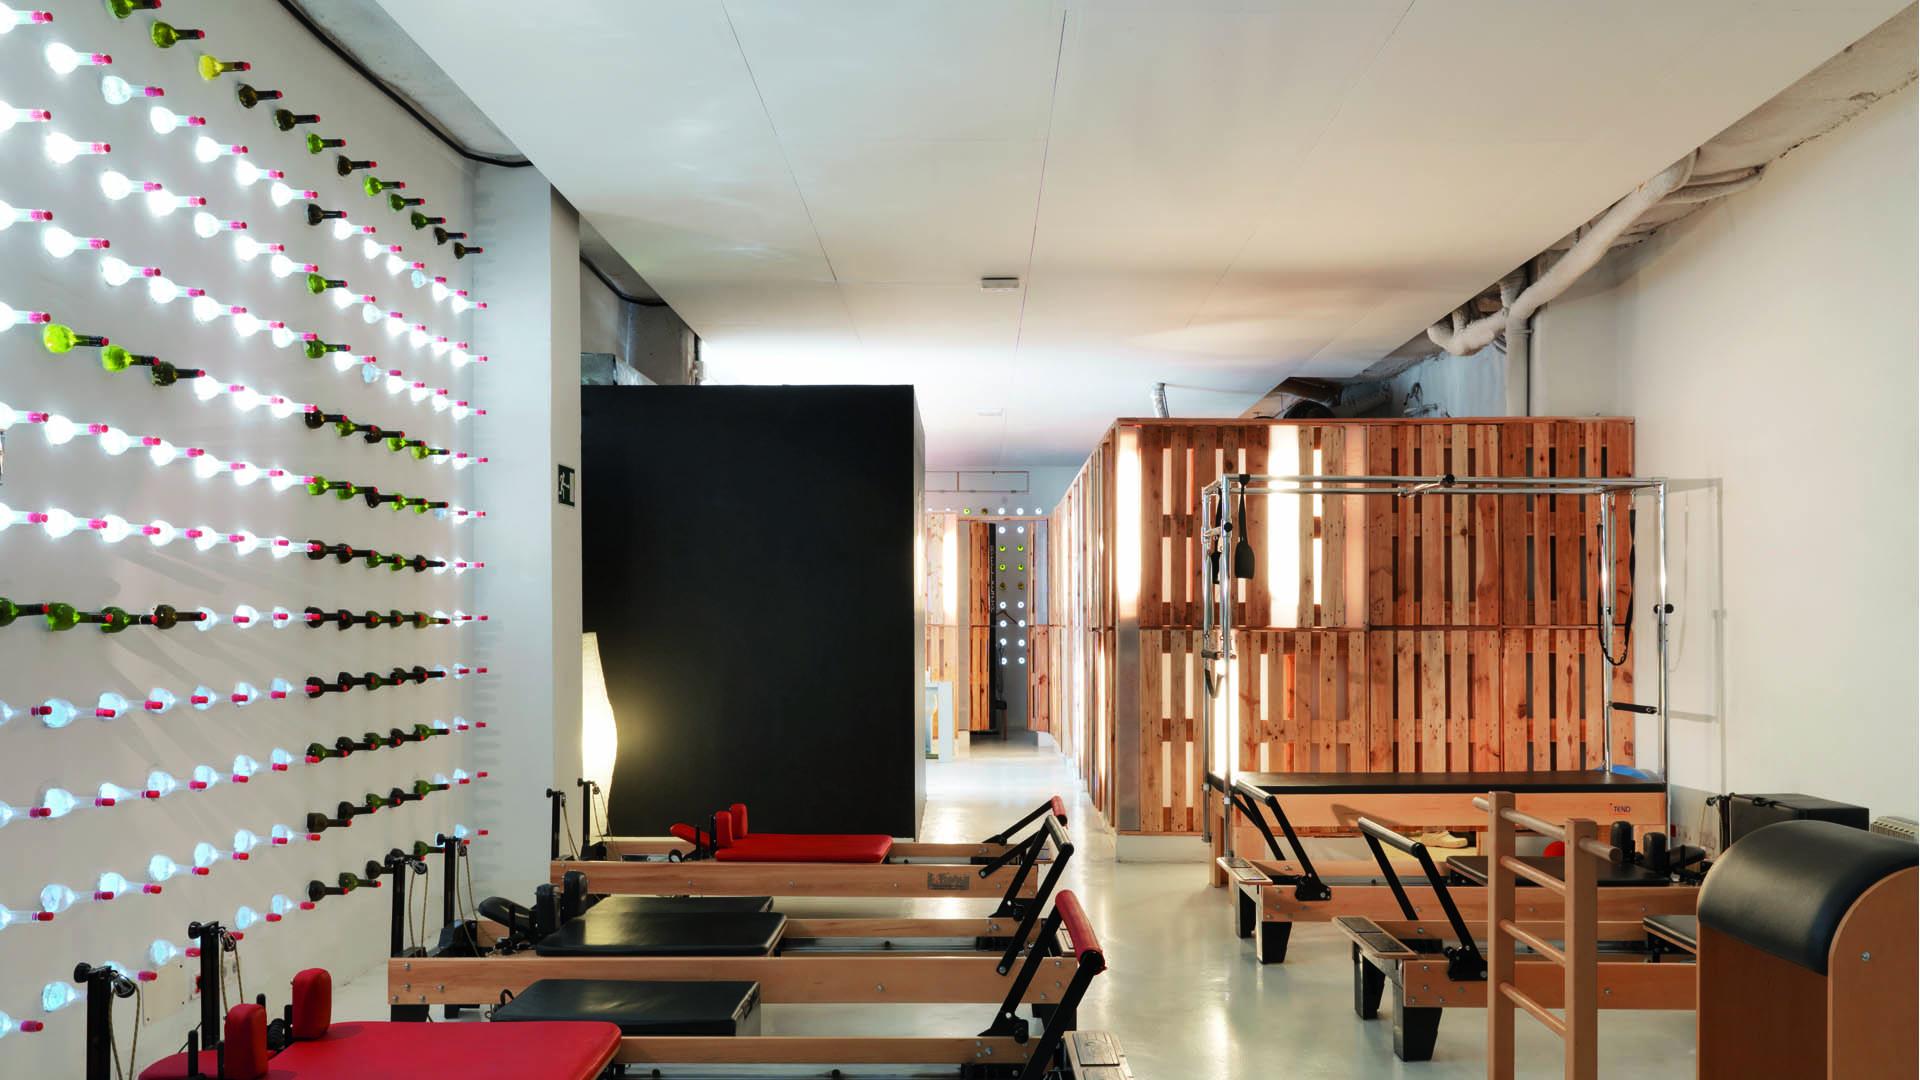 Clinica El arbol